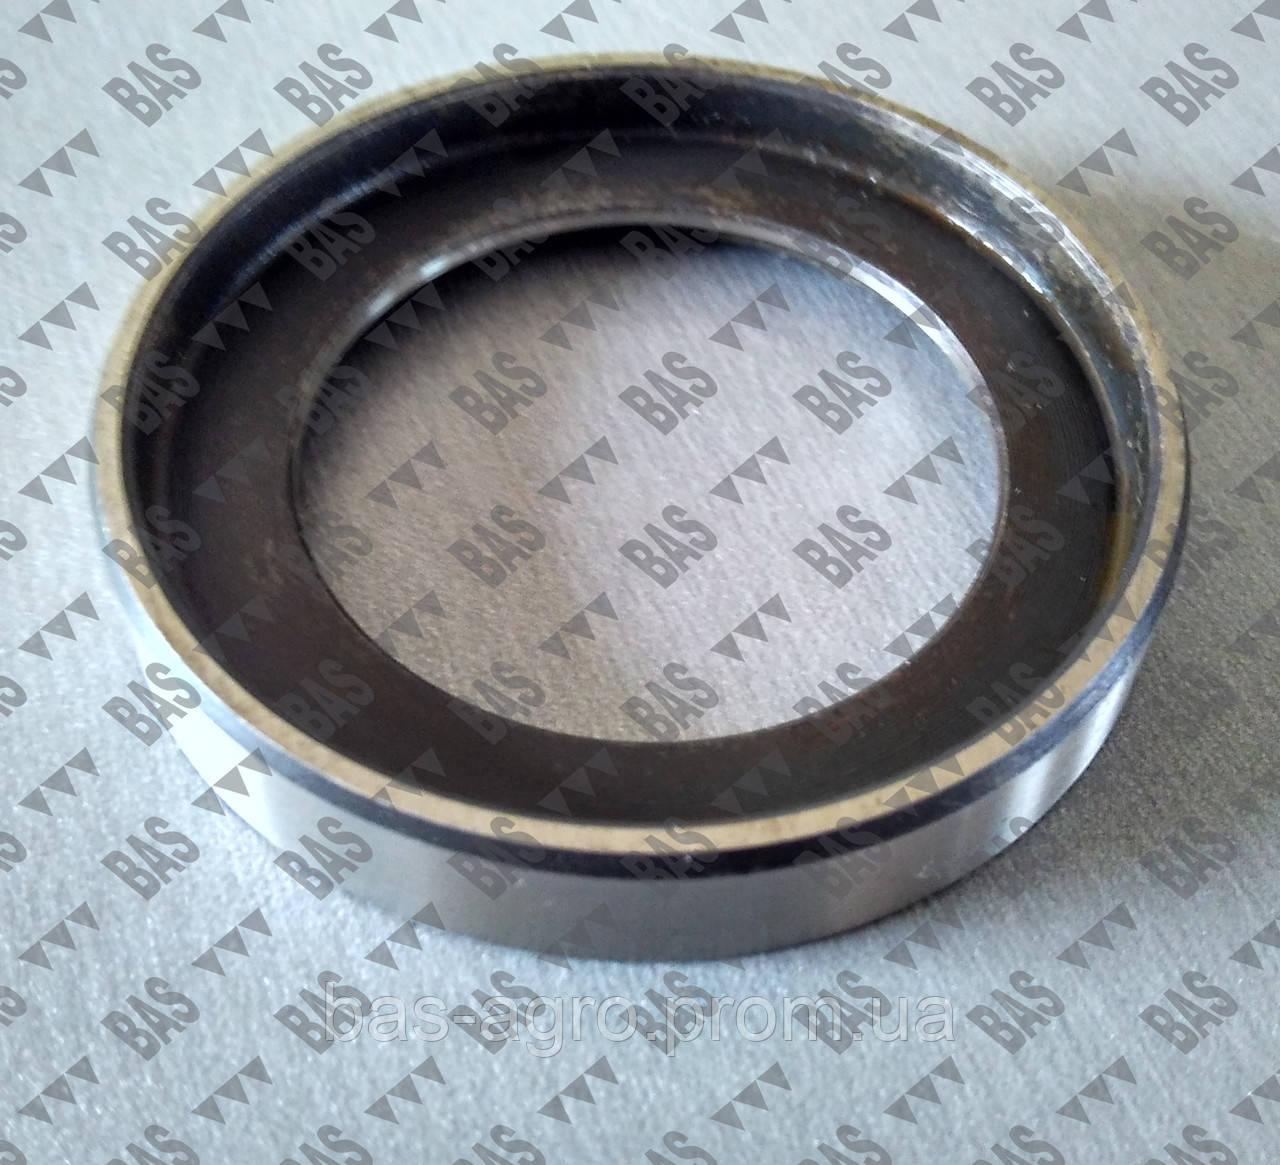 Втулка Geringhoff 002310 аналог